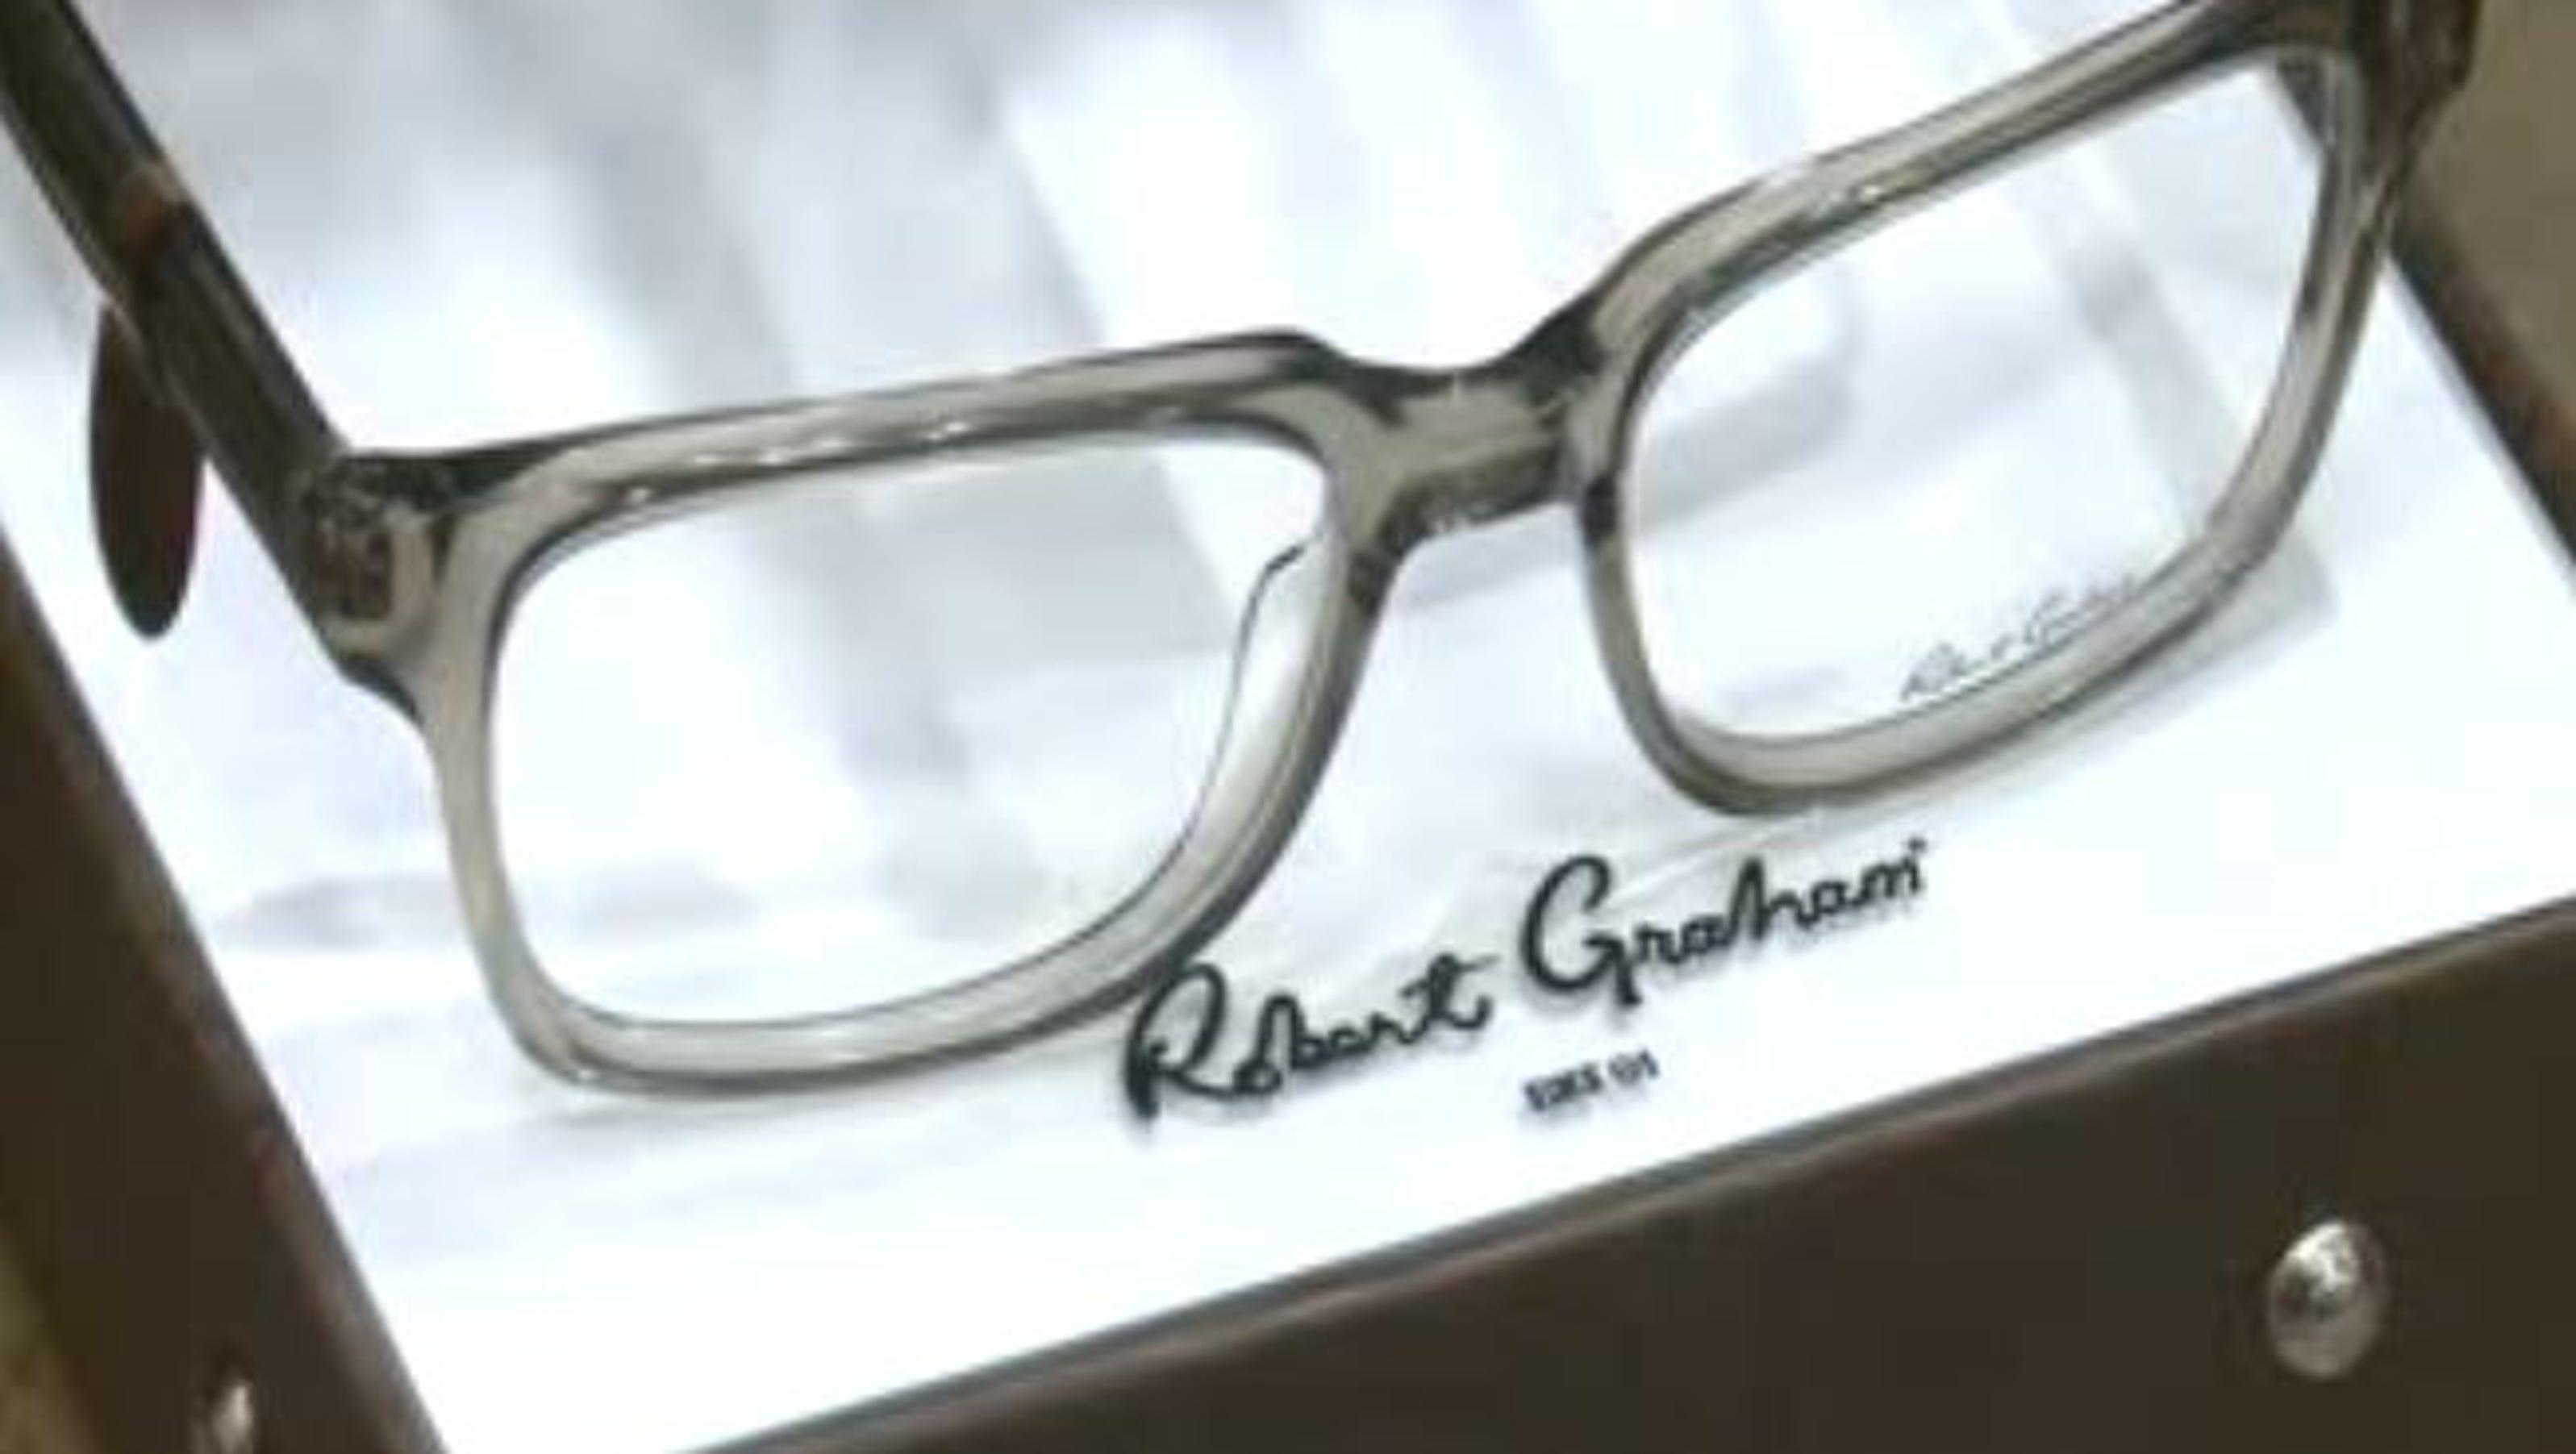 Eyeglass Frames Target : Robberies target designer glasses